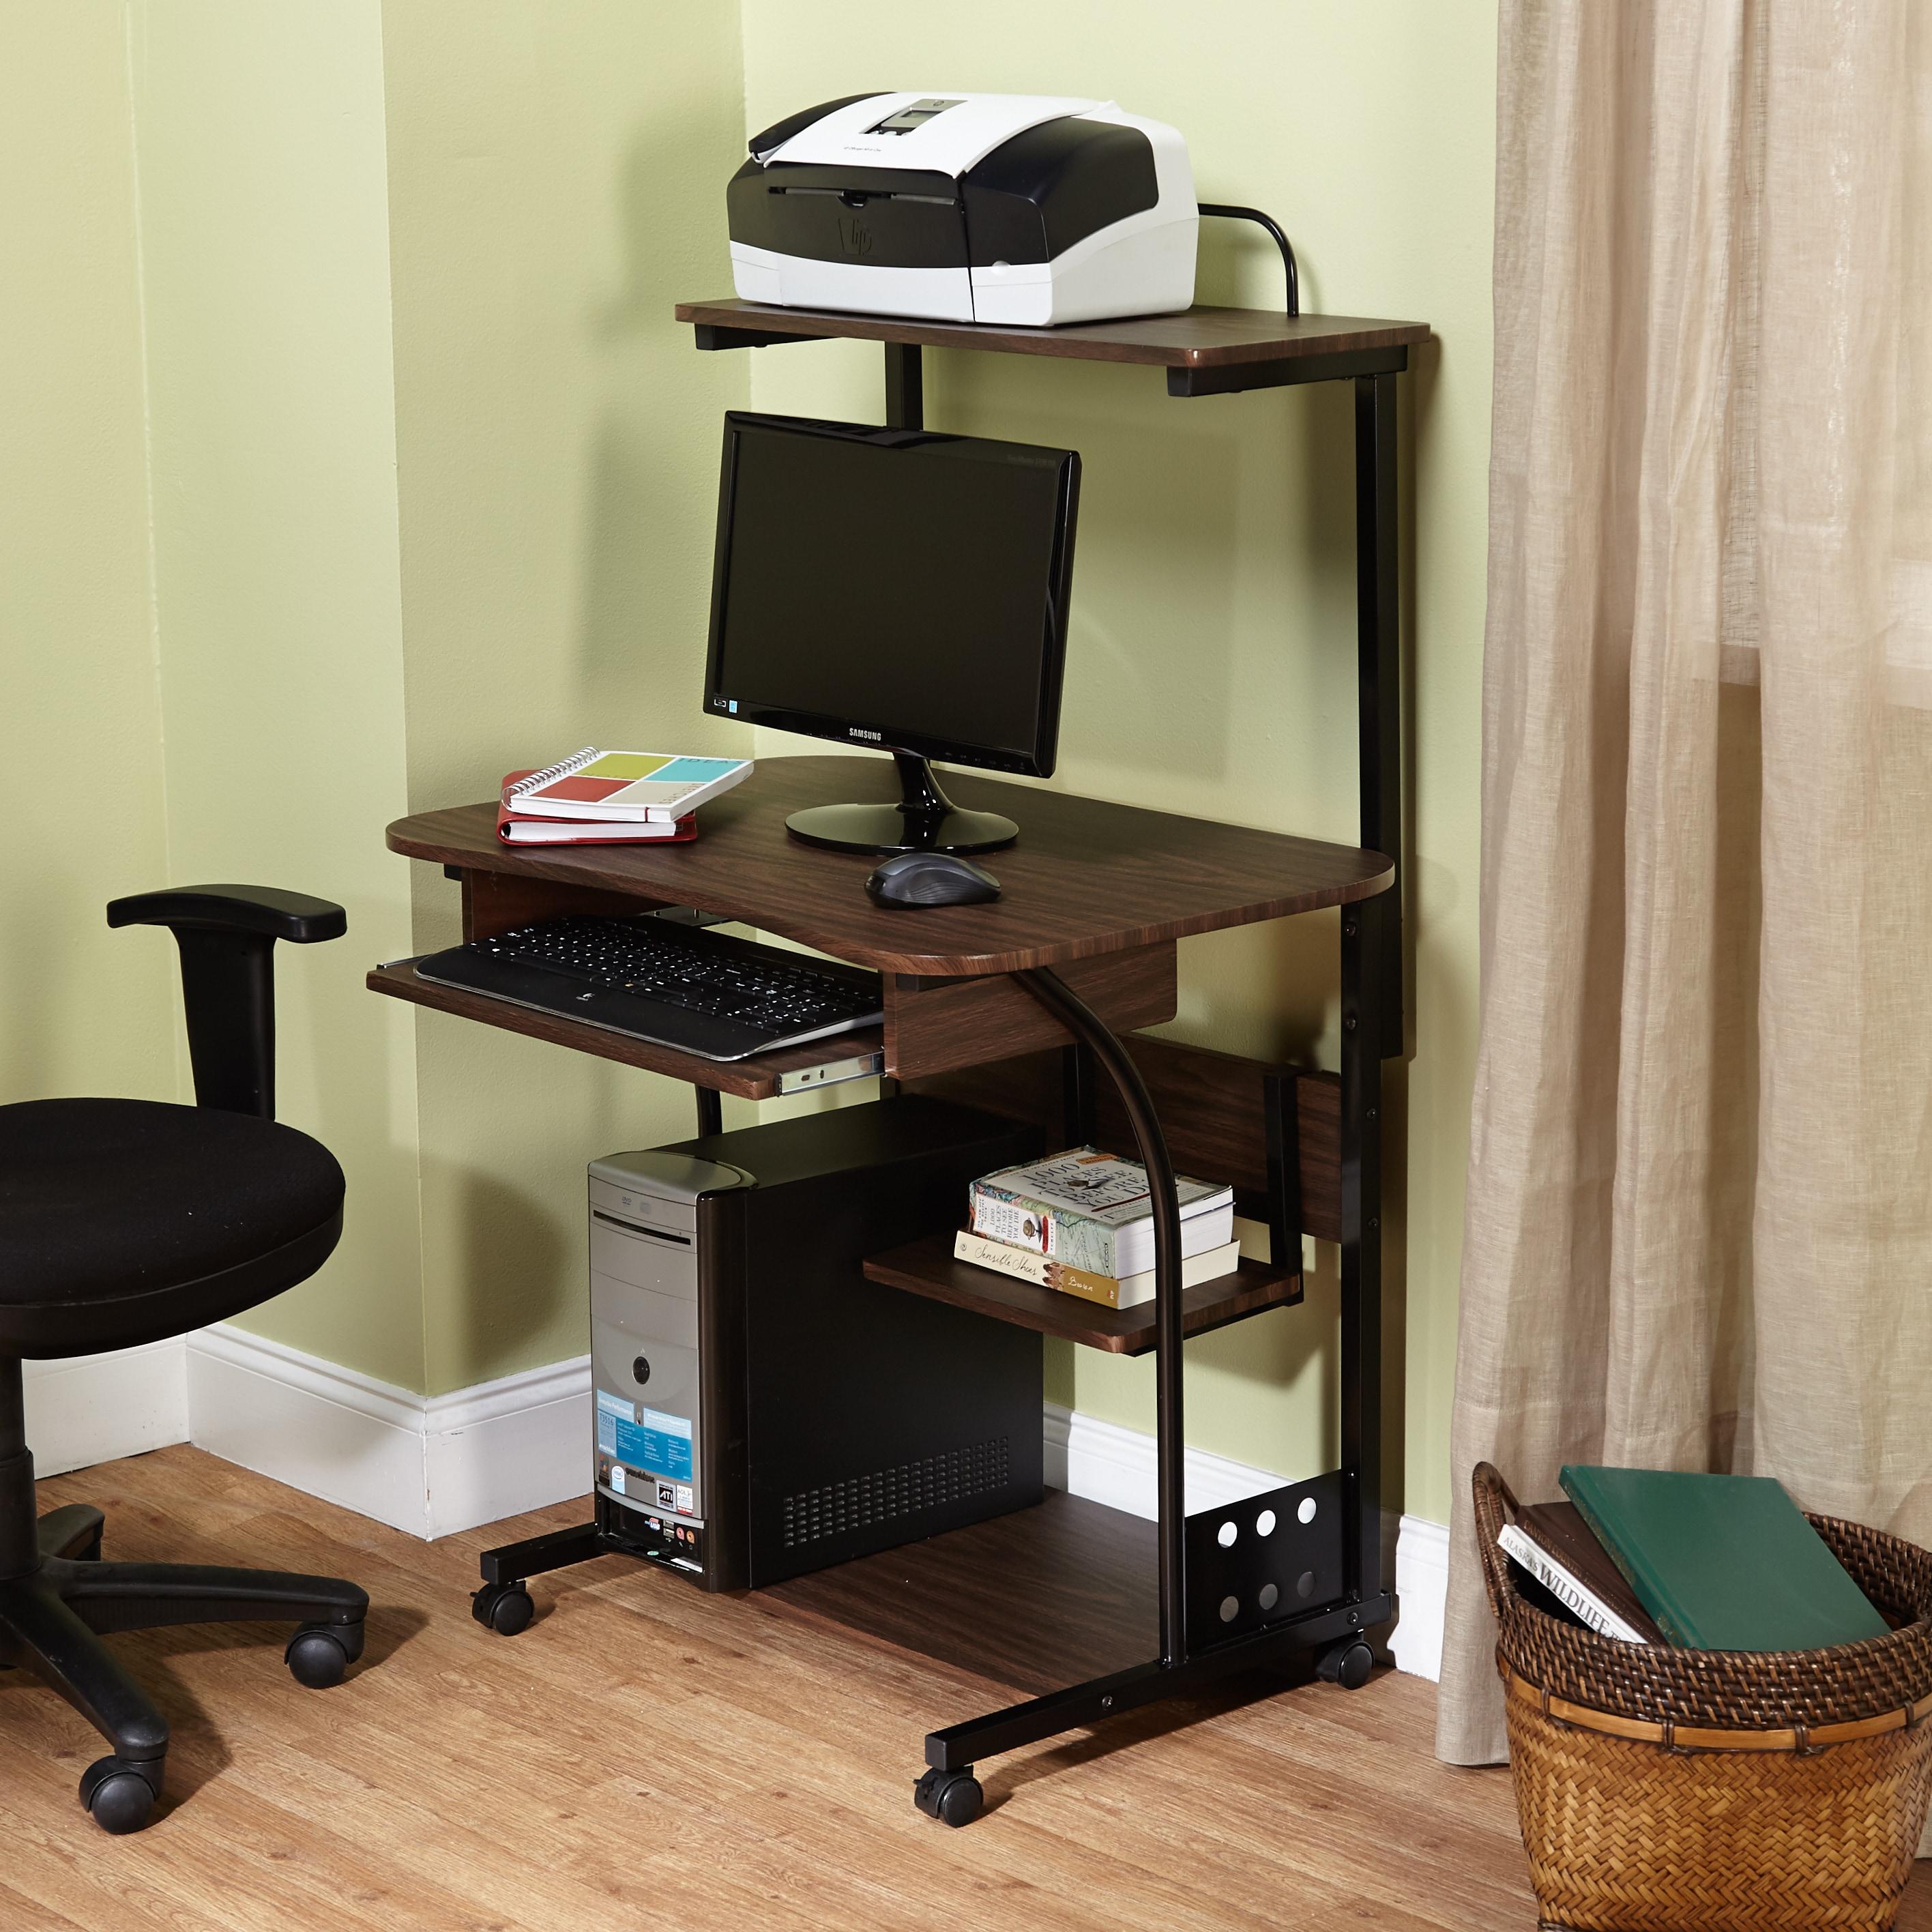 Simple Living Actuate Espresso Mobile Computer Desk (Actu...